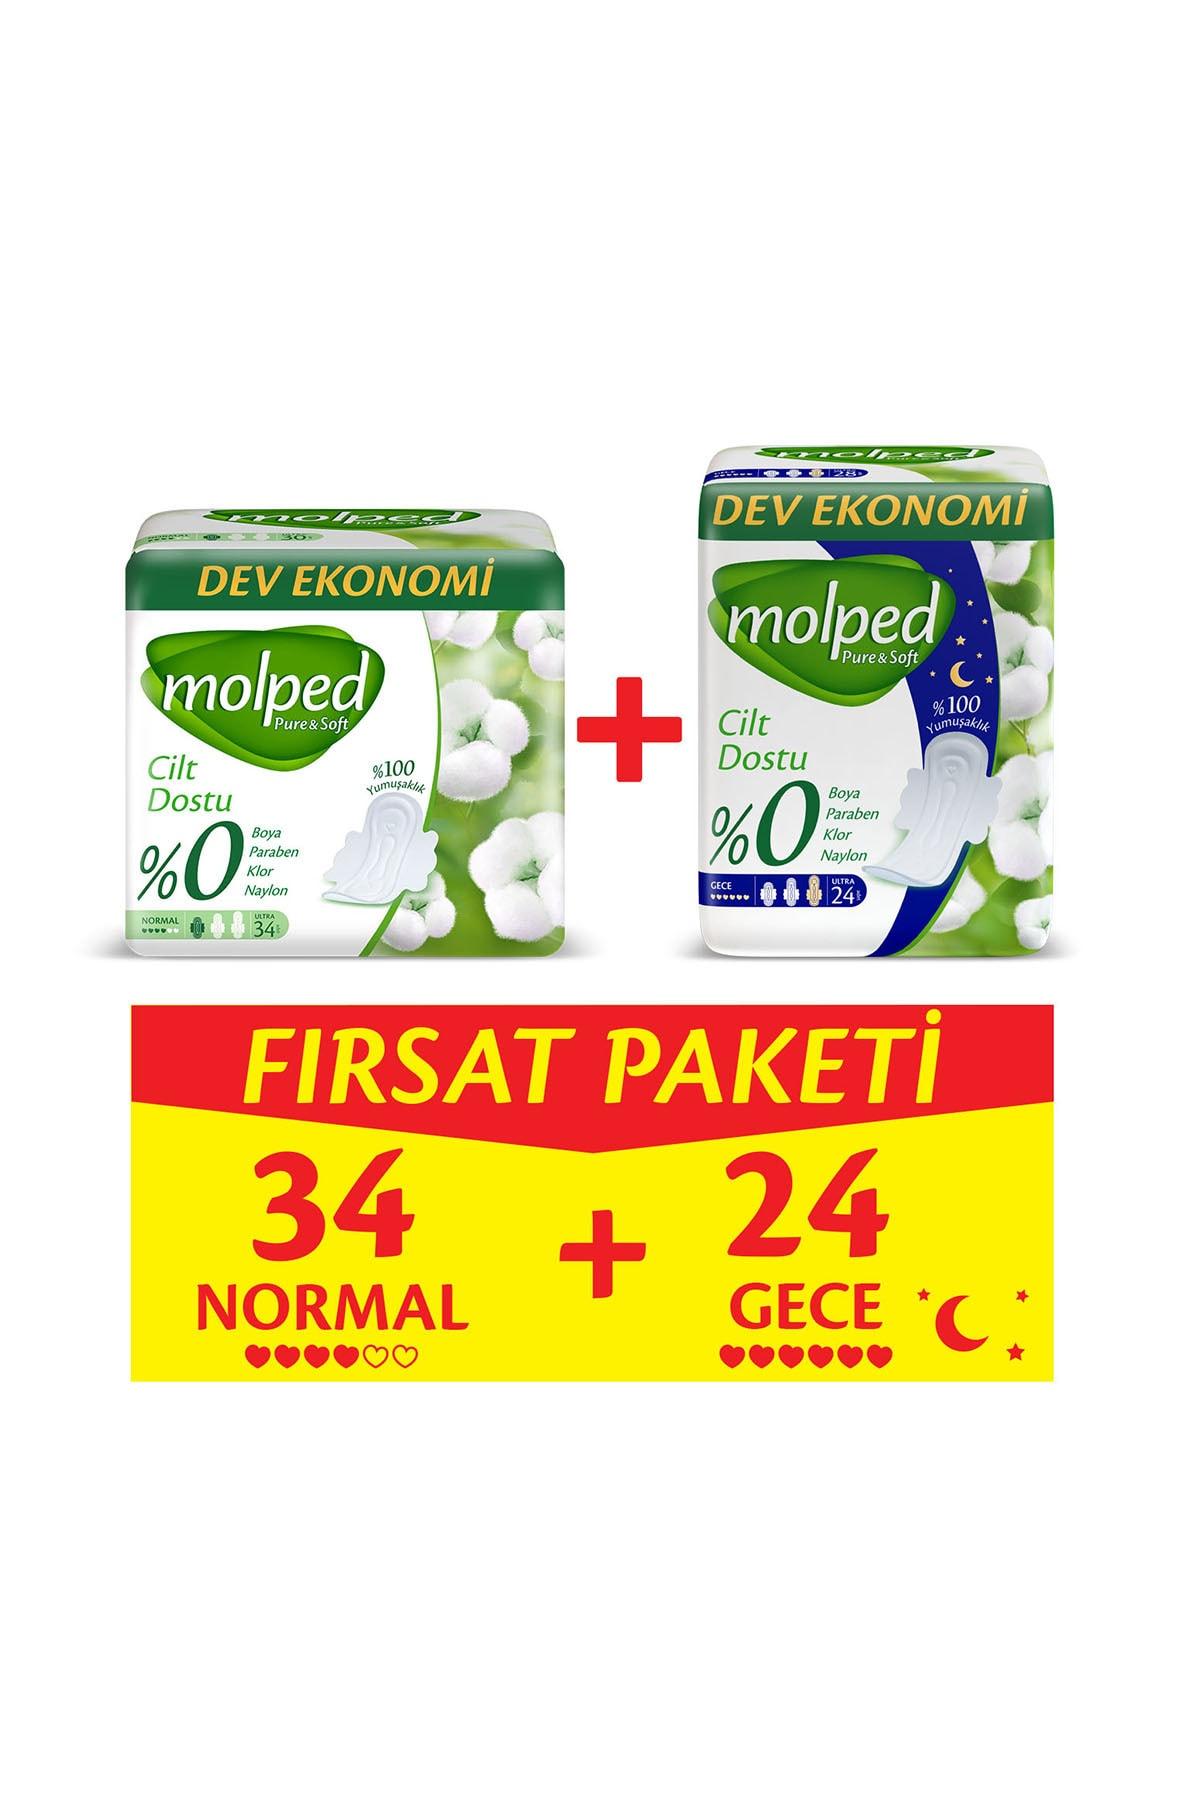 Molped Pure&Soft Normal 34 Adet + Gece 24 Adet Fırsat Paketi